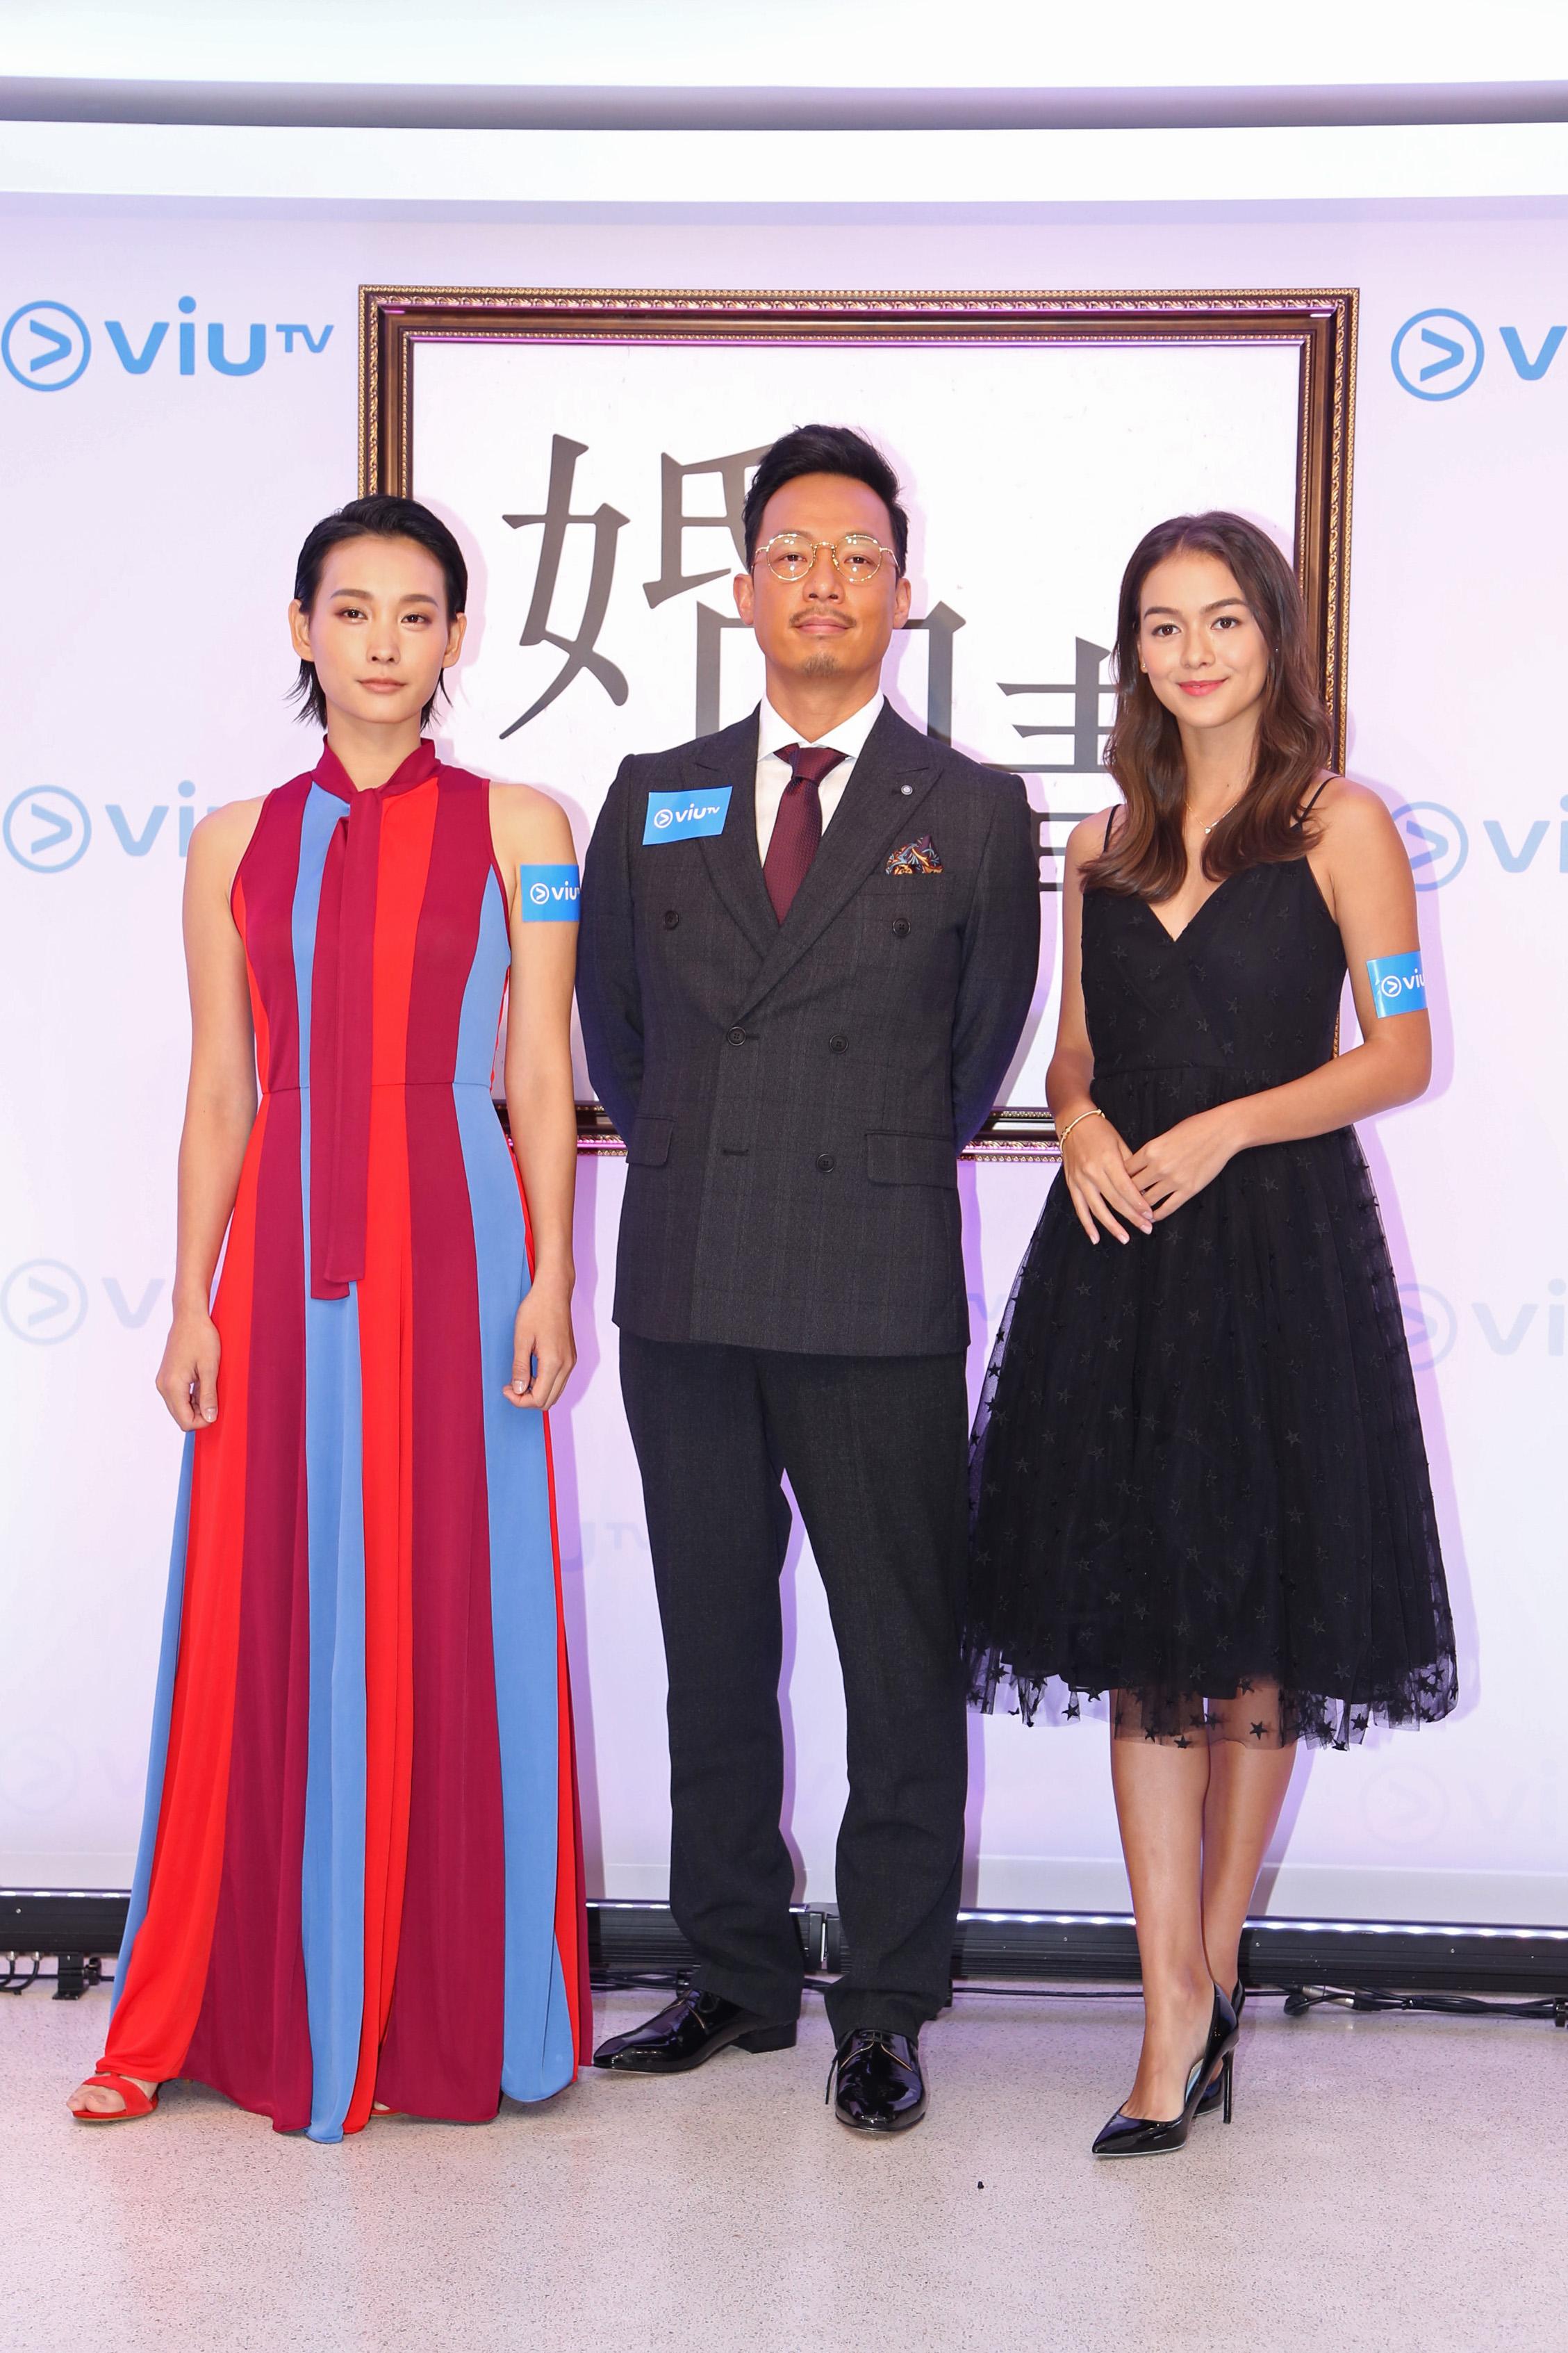 ViuTV新劇《婚內情》鄧萃雯陳錦鴻廖碧兒主演